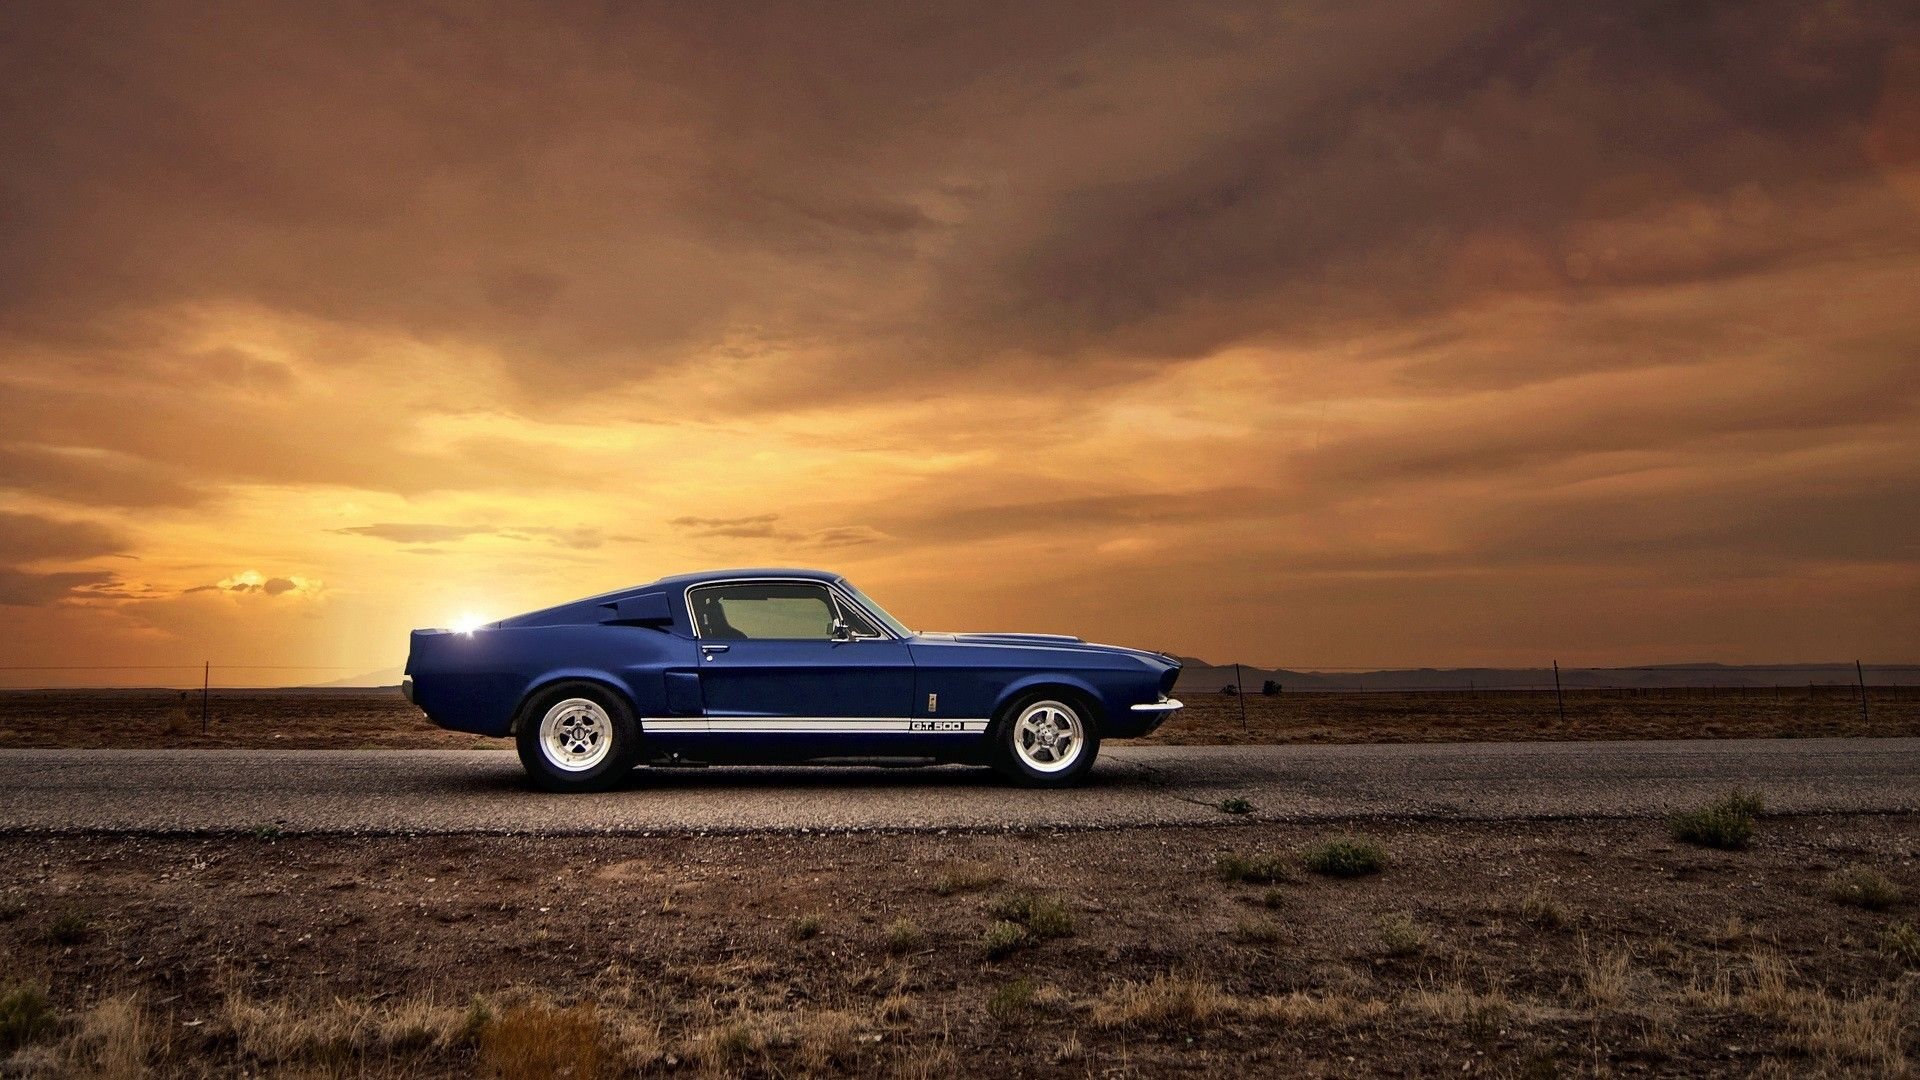 Muscle Car Wallpapers For Desktop: Muscle Car Desktop Wallpapers